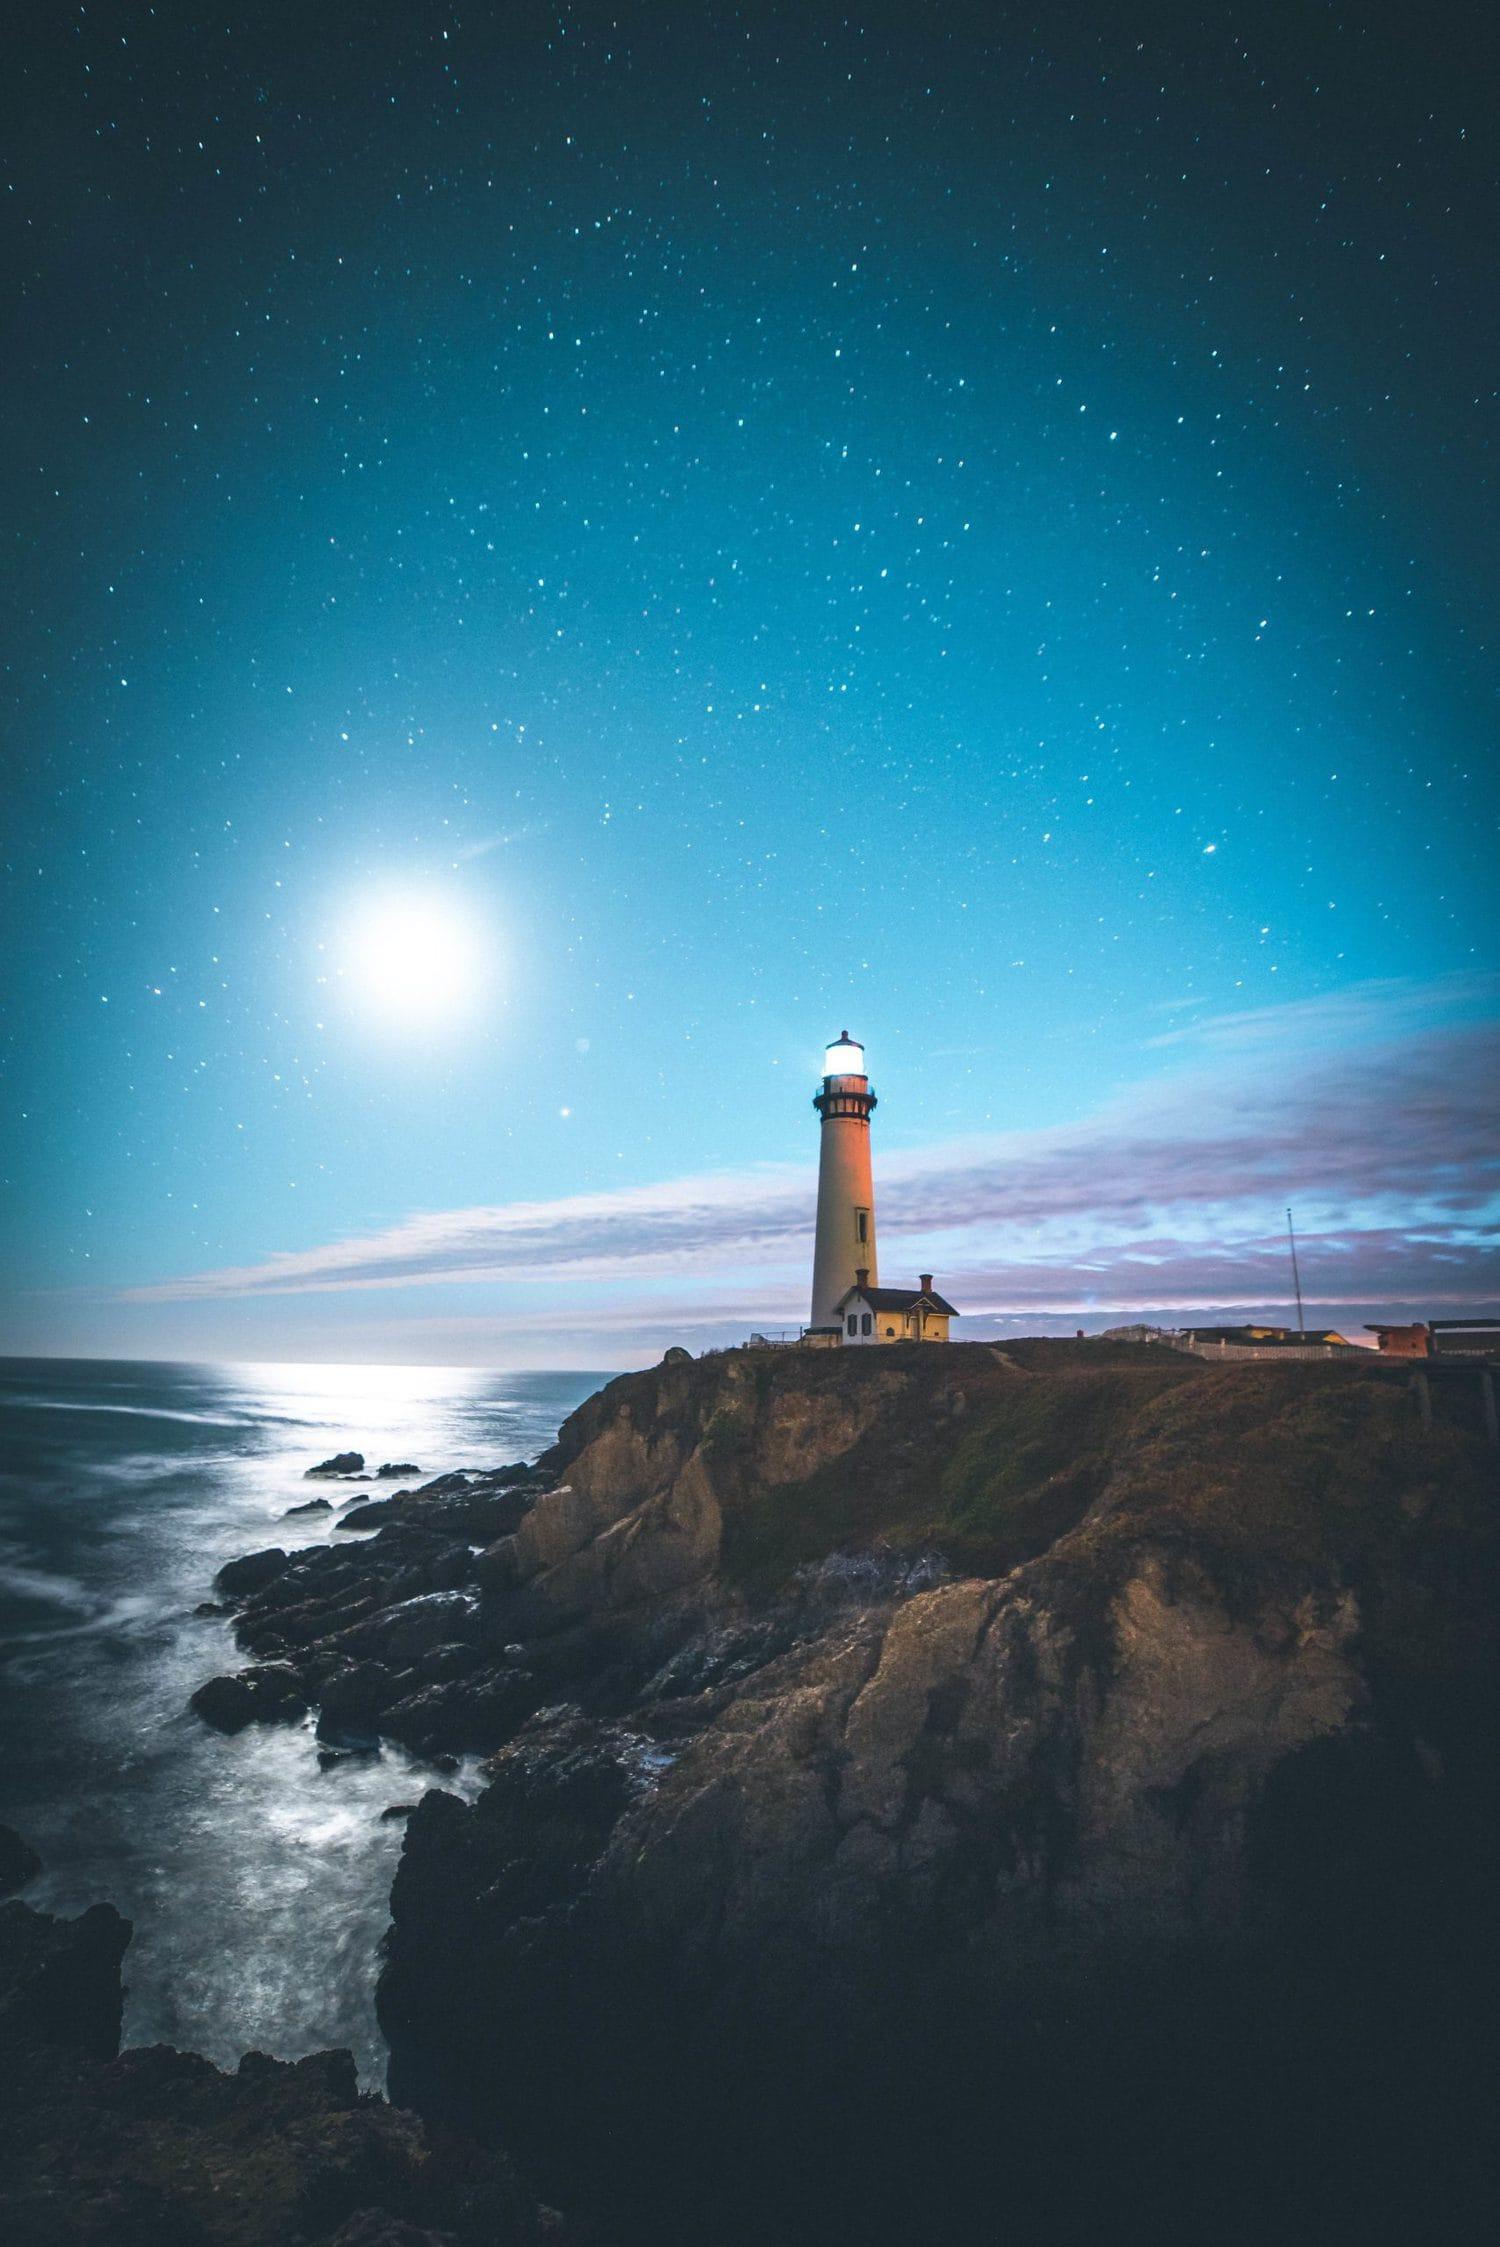 Faro con cielo estrellado fotografiado con un gran angular